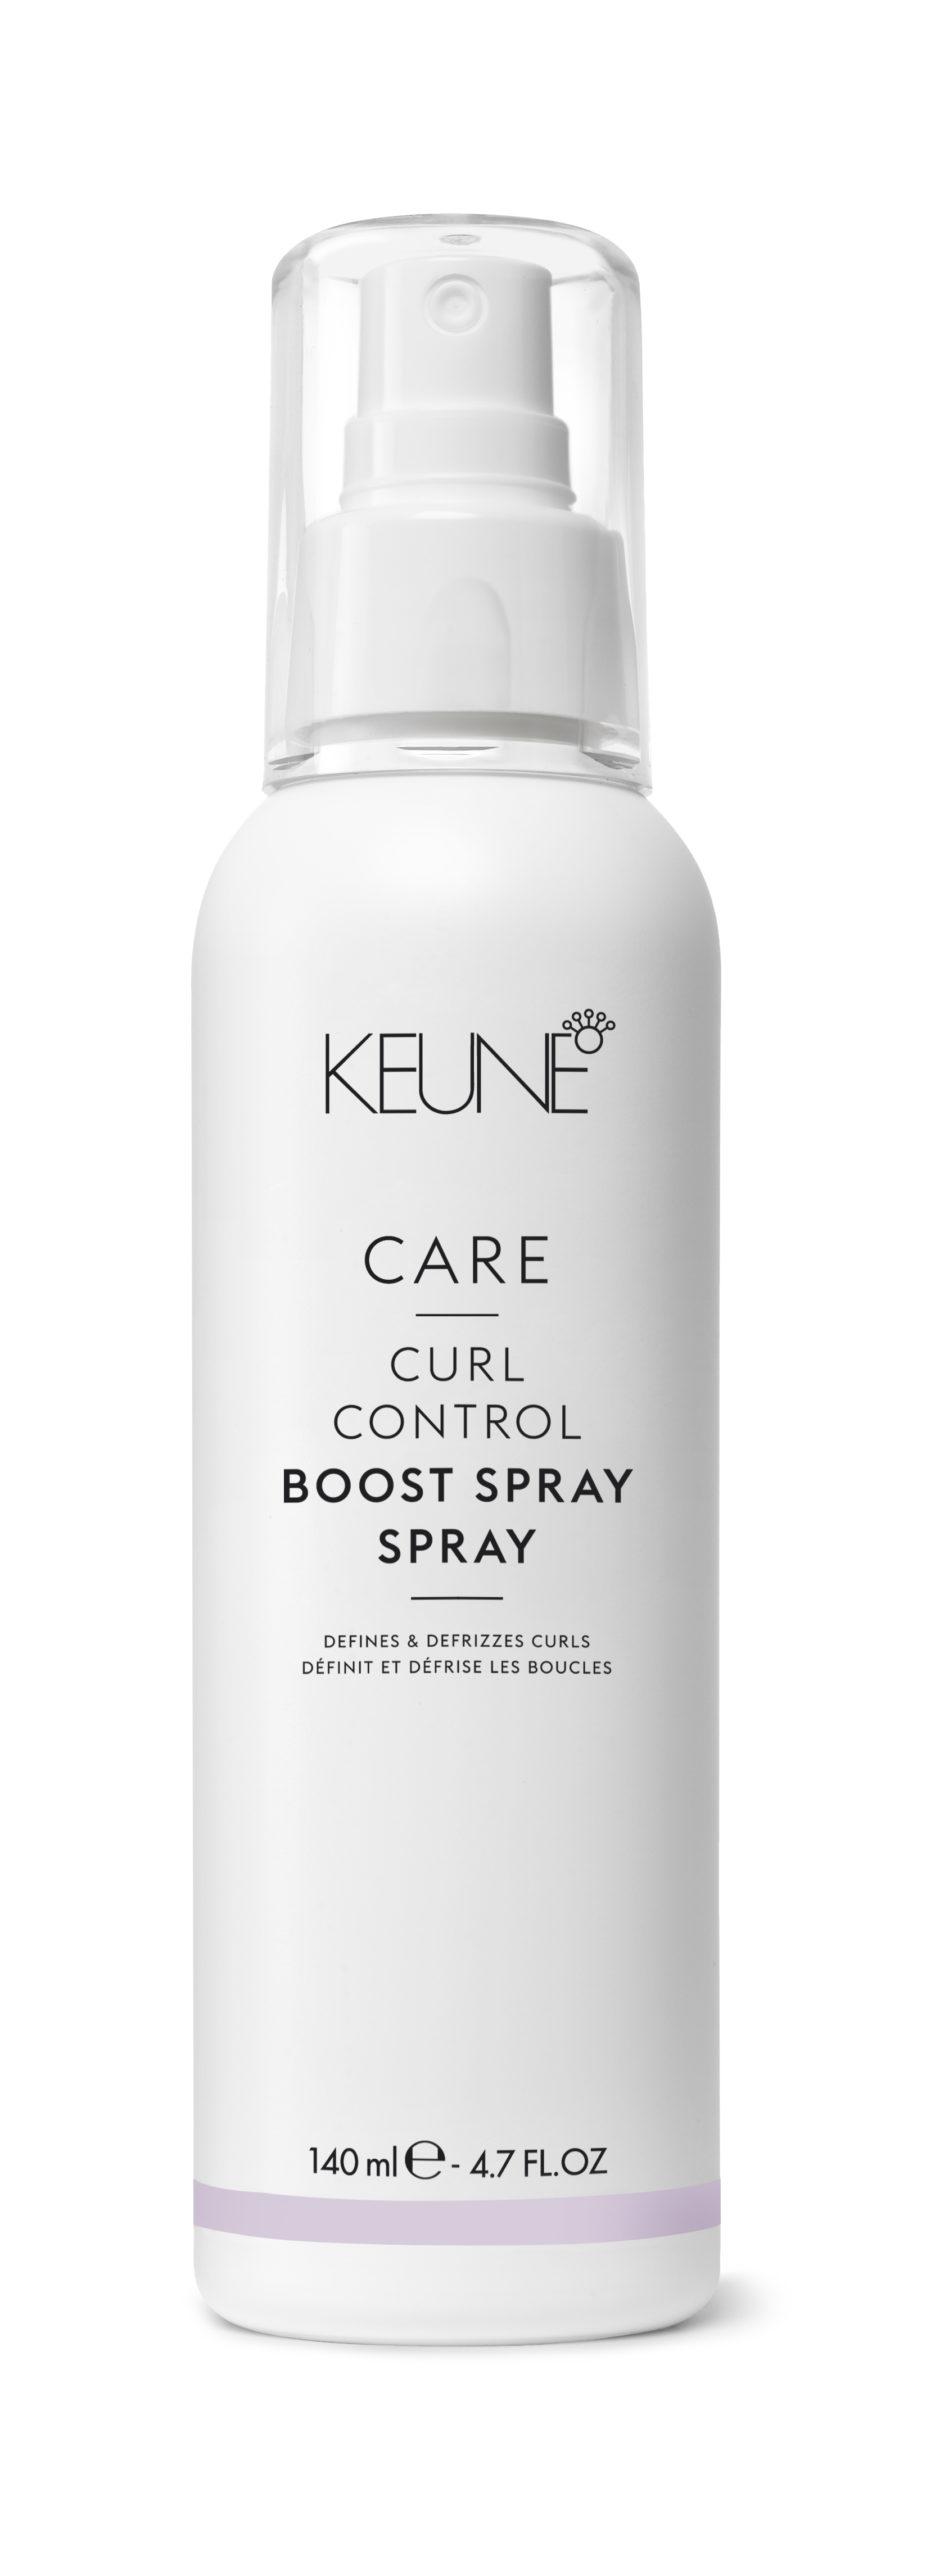 Care-Curl-Control-Boost-Spray-140ml-highres